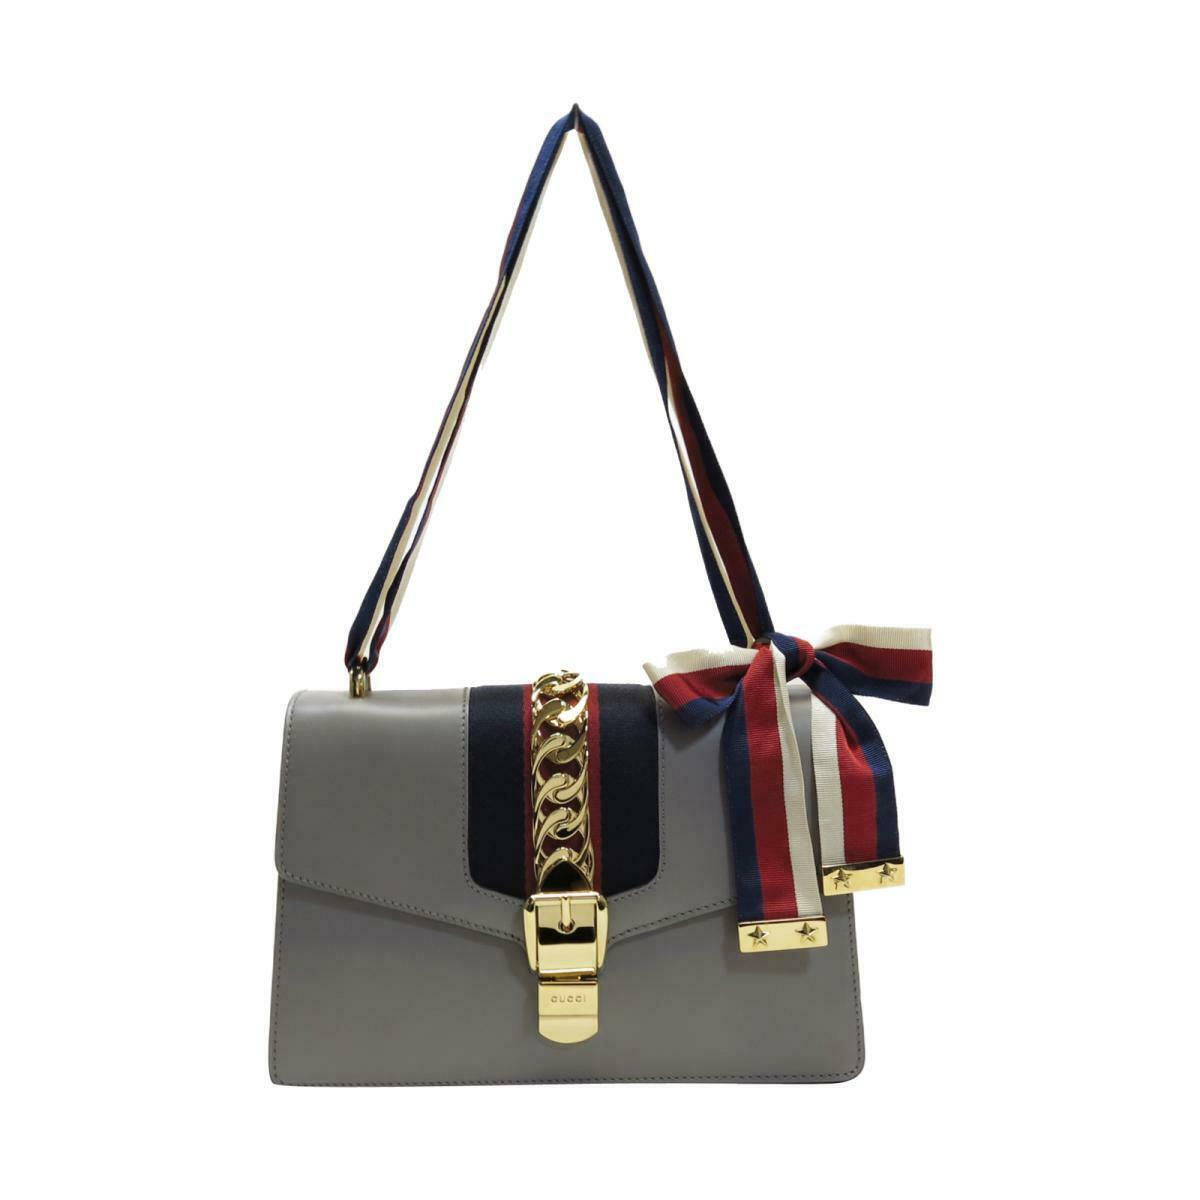 13d53670a04f ... https   tokyotw.brandoff.tw  http   stores.ebay.com brandofftw   https   www.reebonz.com my boutique brandoff-taiwan …  GUCCI  Bags  Purses   Accessories ...